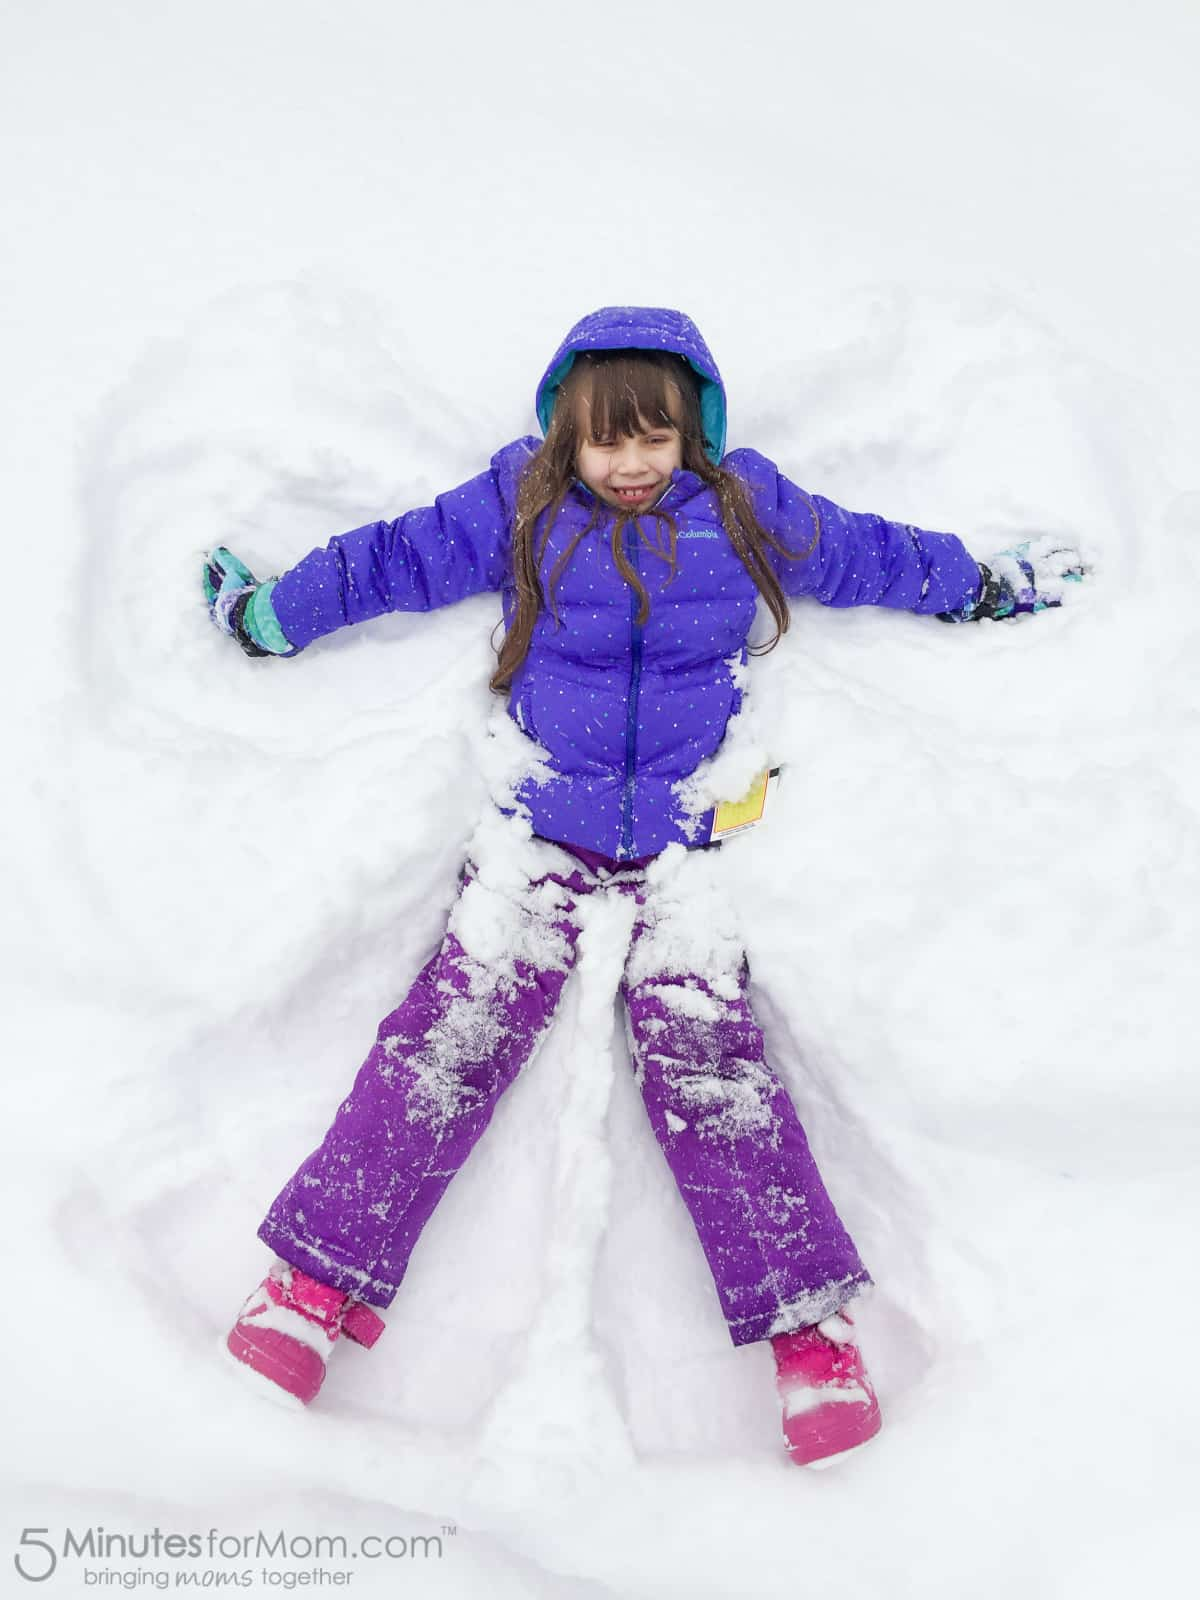 sea-to-sky-snow-angel